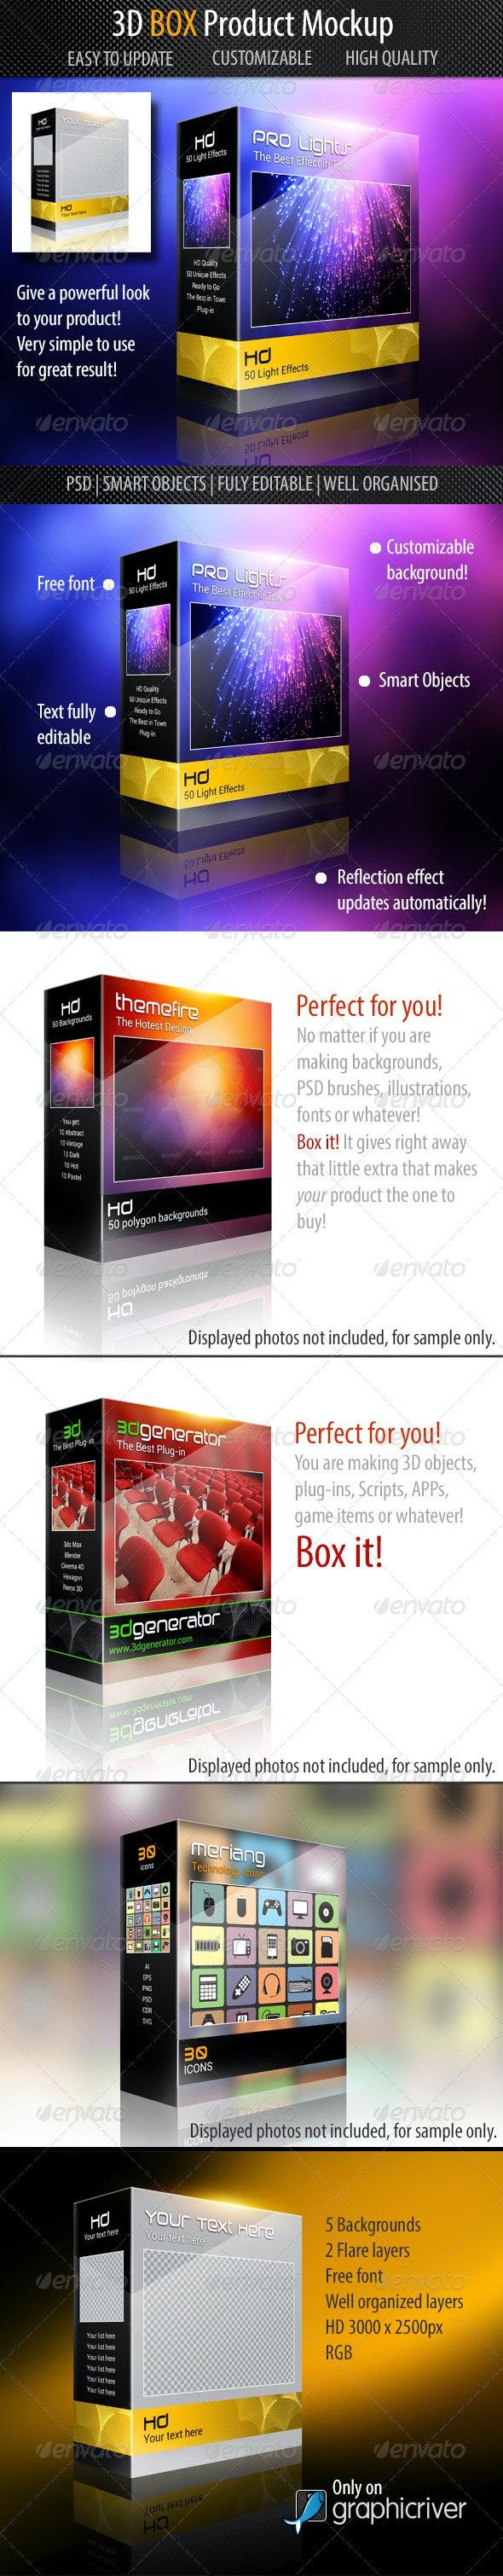 3D Box Mockup - Packaging Product Mock-Ups